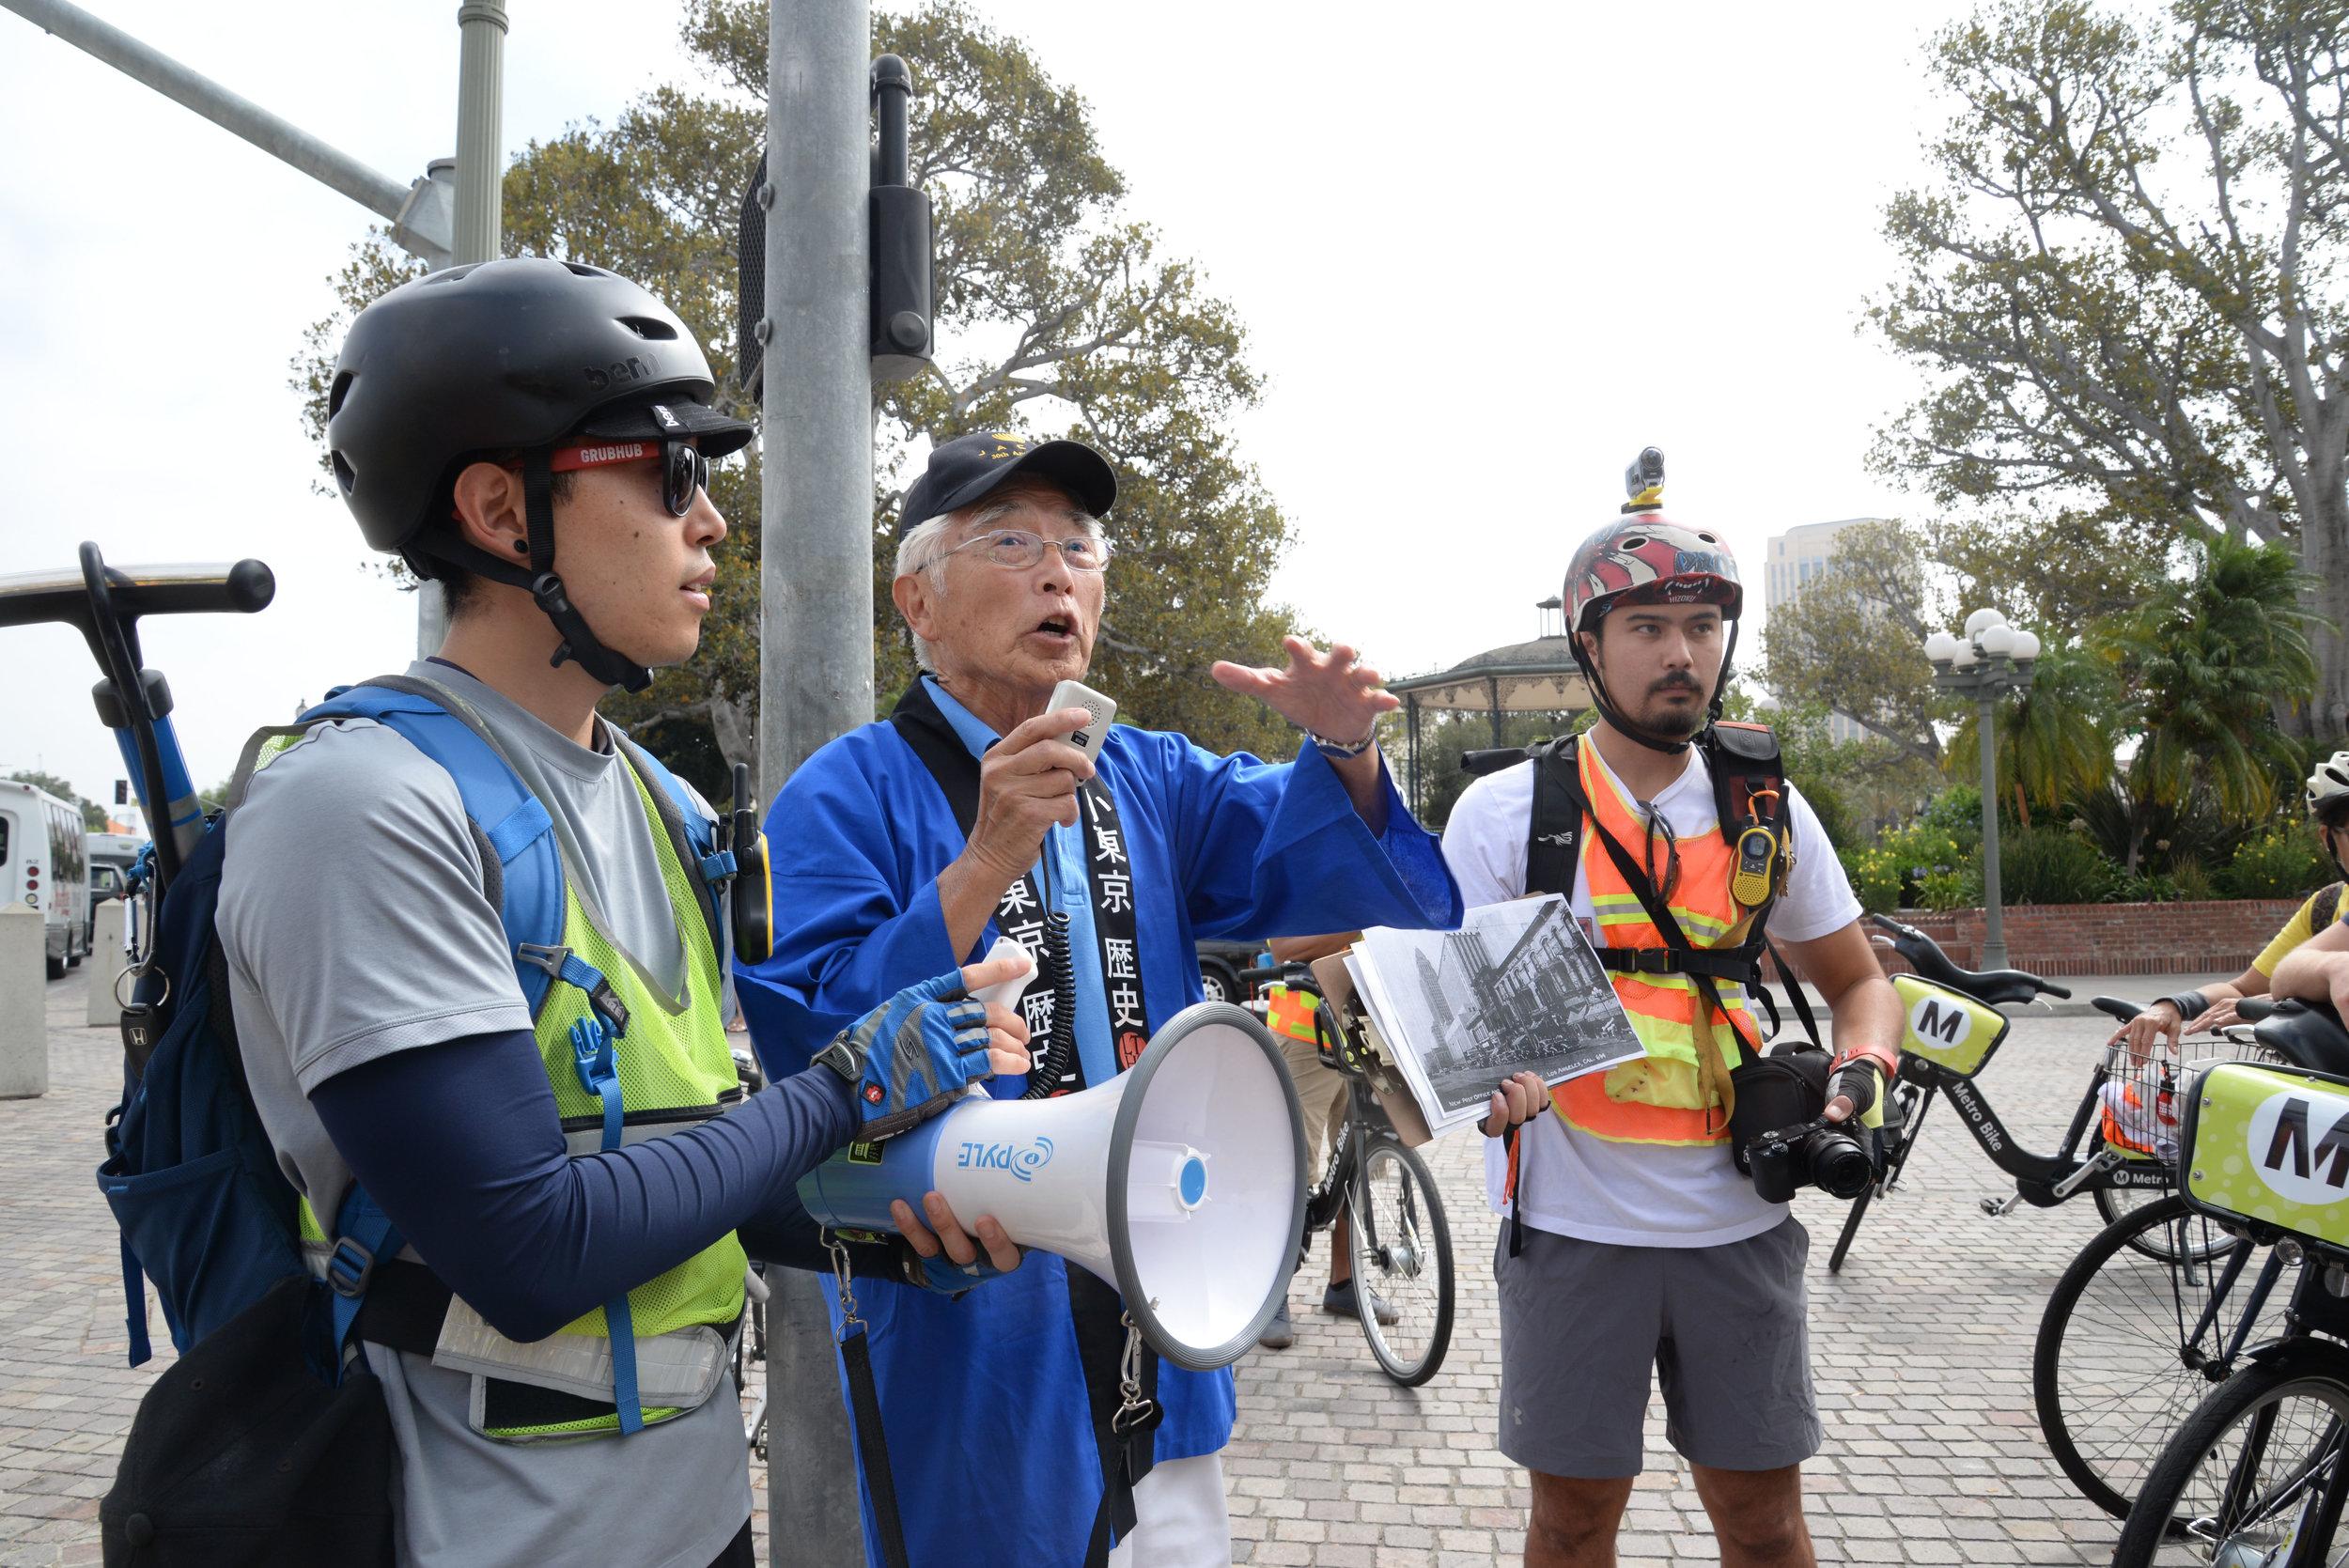 Jitensha Bike Tour